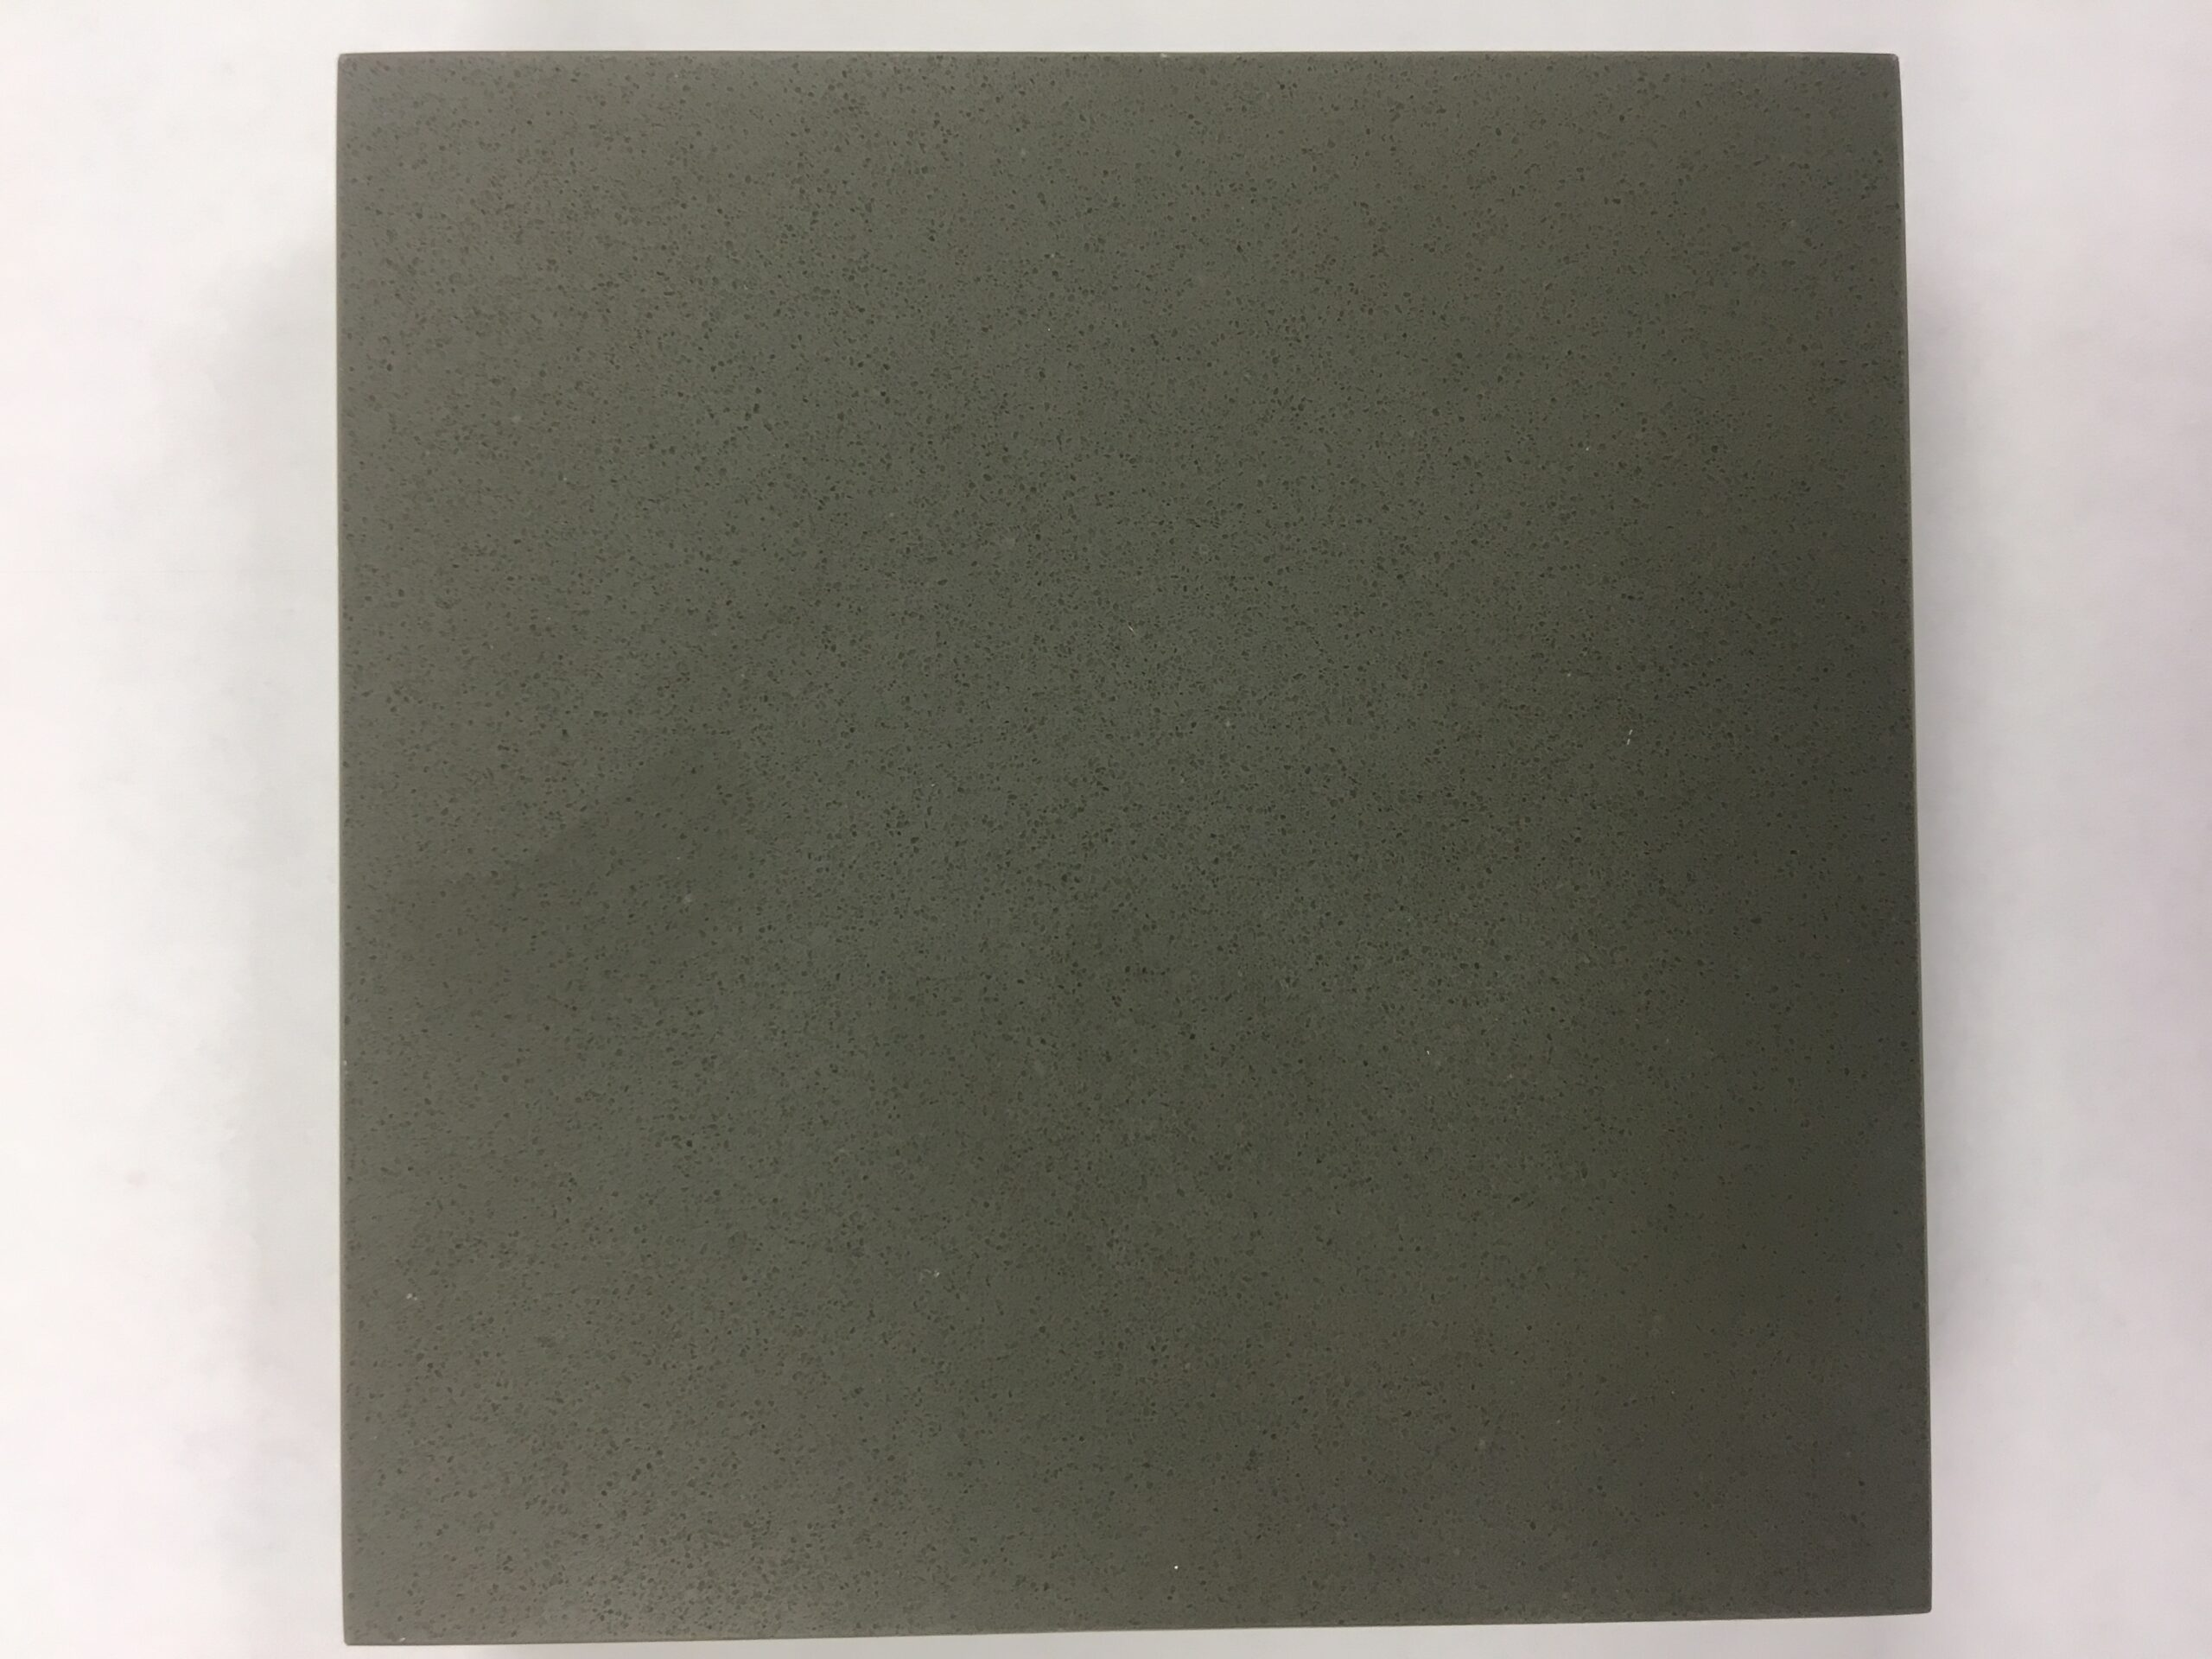 Heirloom Gray Cq 2cm